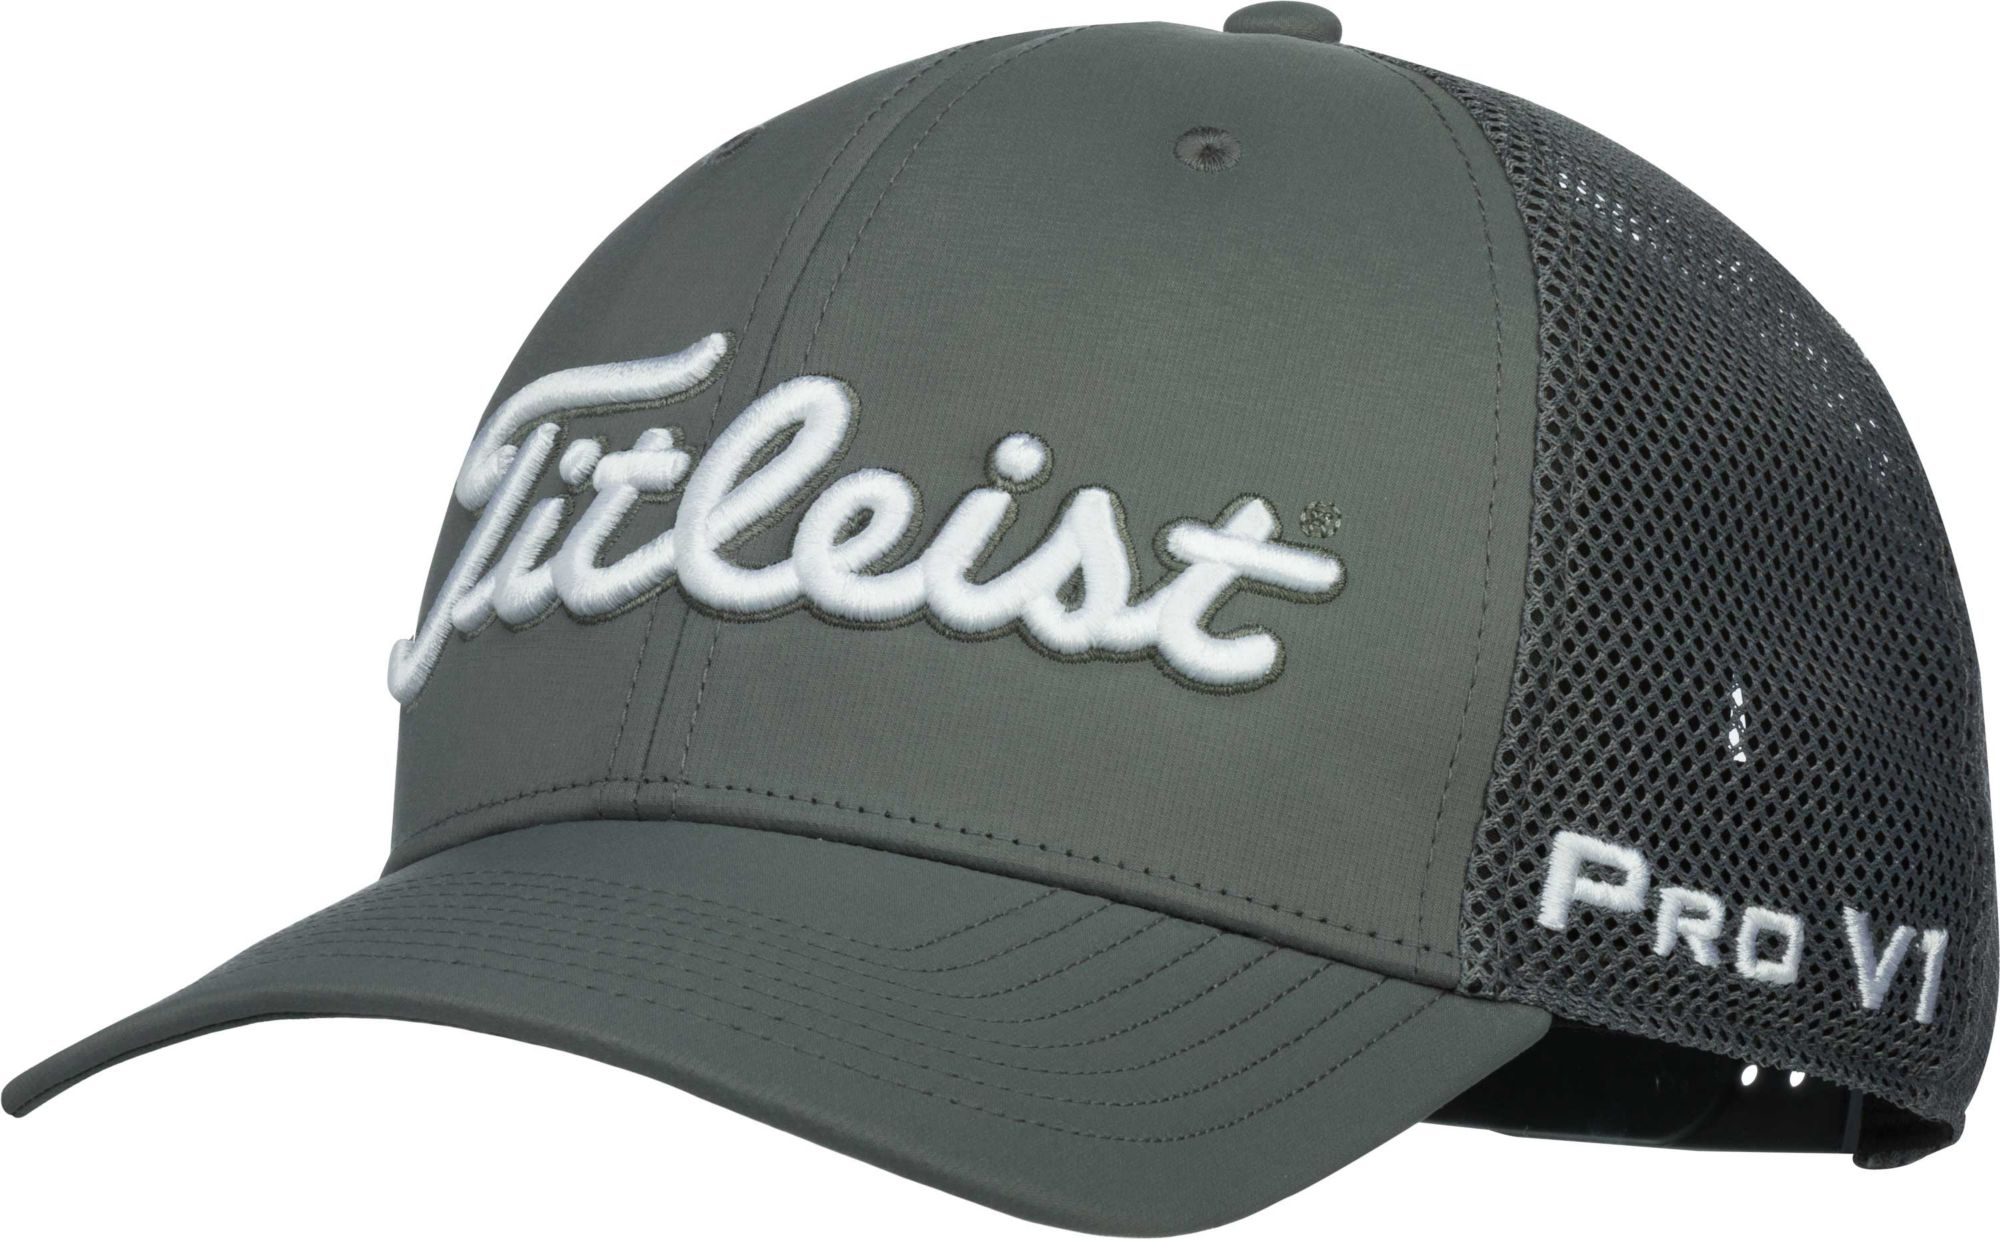 titleist tour mesh snapback golf hat - Walmart.com 365dda69cdc